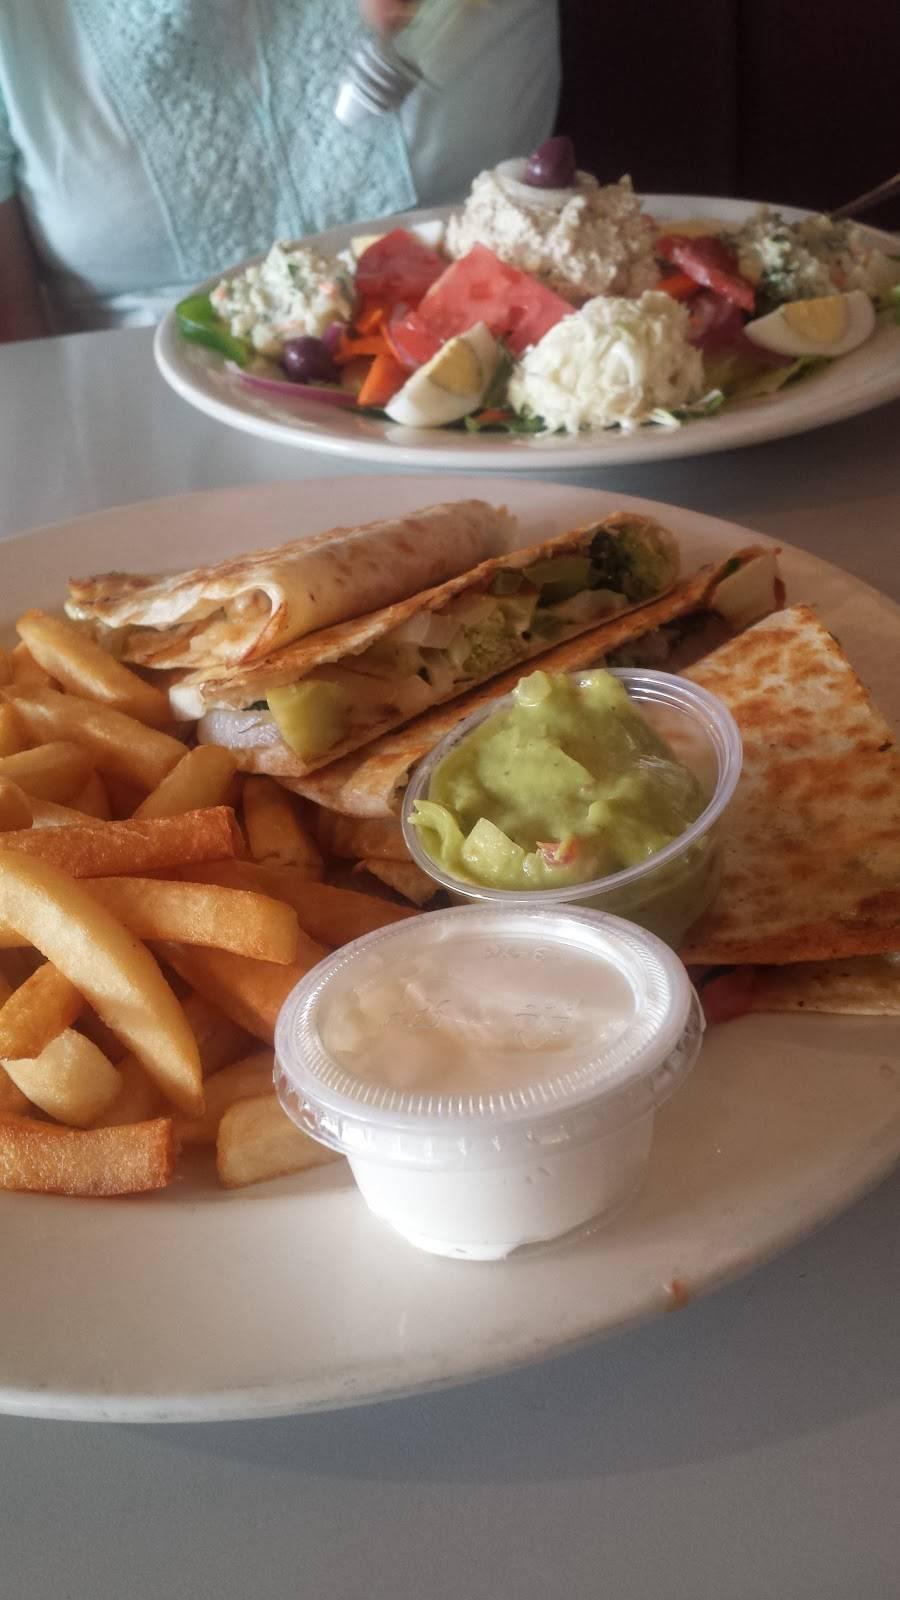 New Capitol | restaurant | 2 W Kingsbridge Rd, Bronx, NY 10468, USA | 7185849234 OR +1 718-584-9234